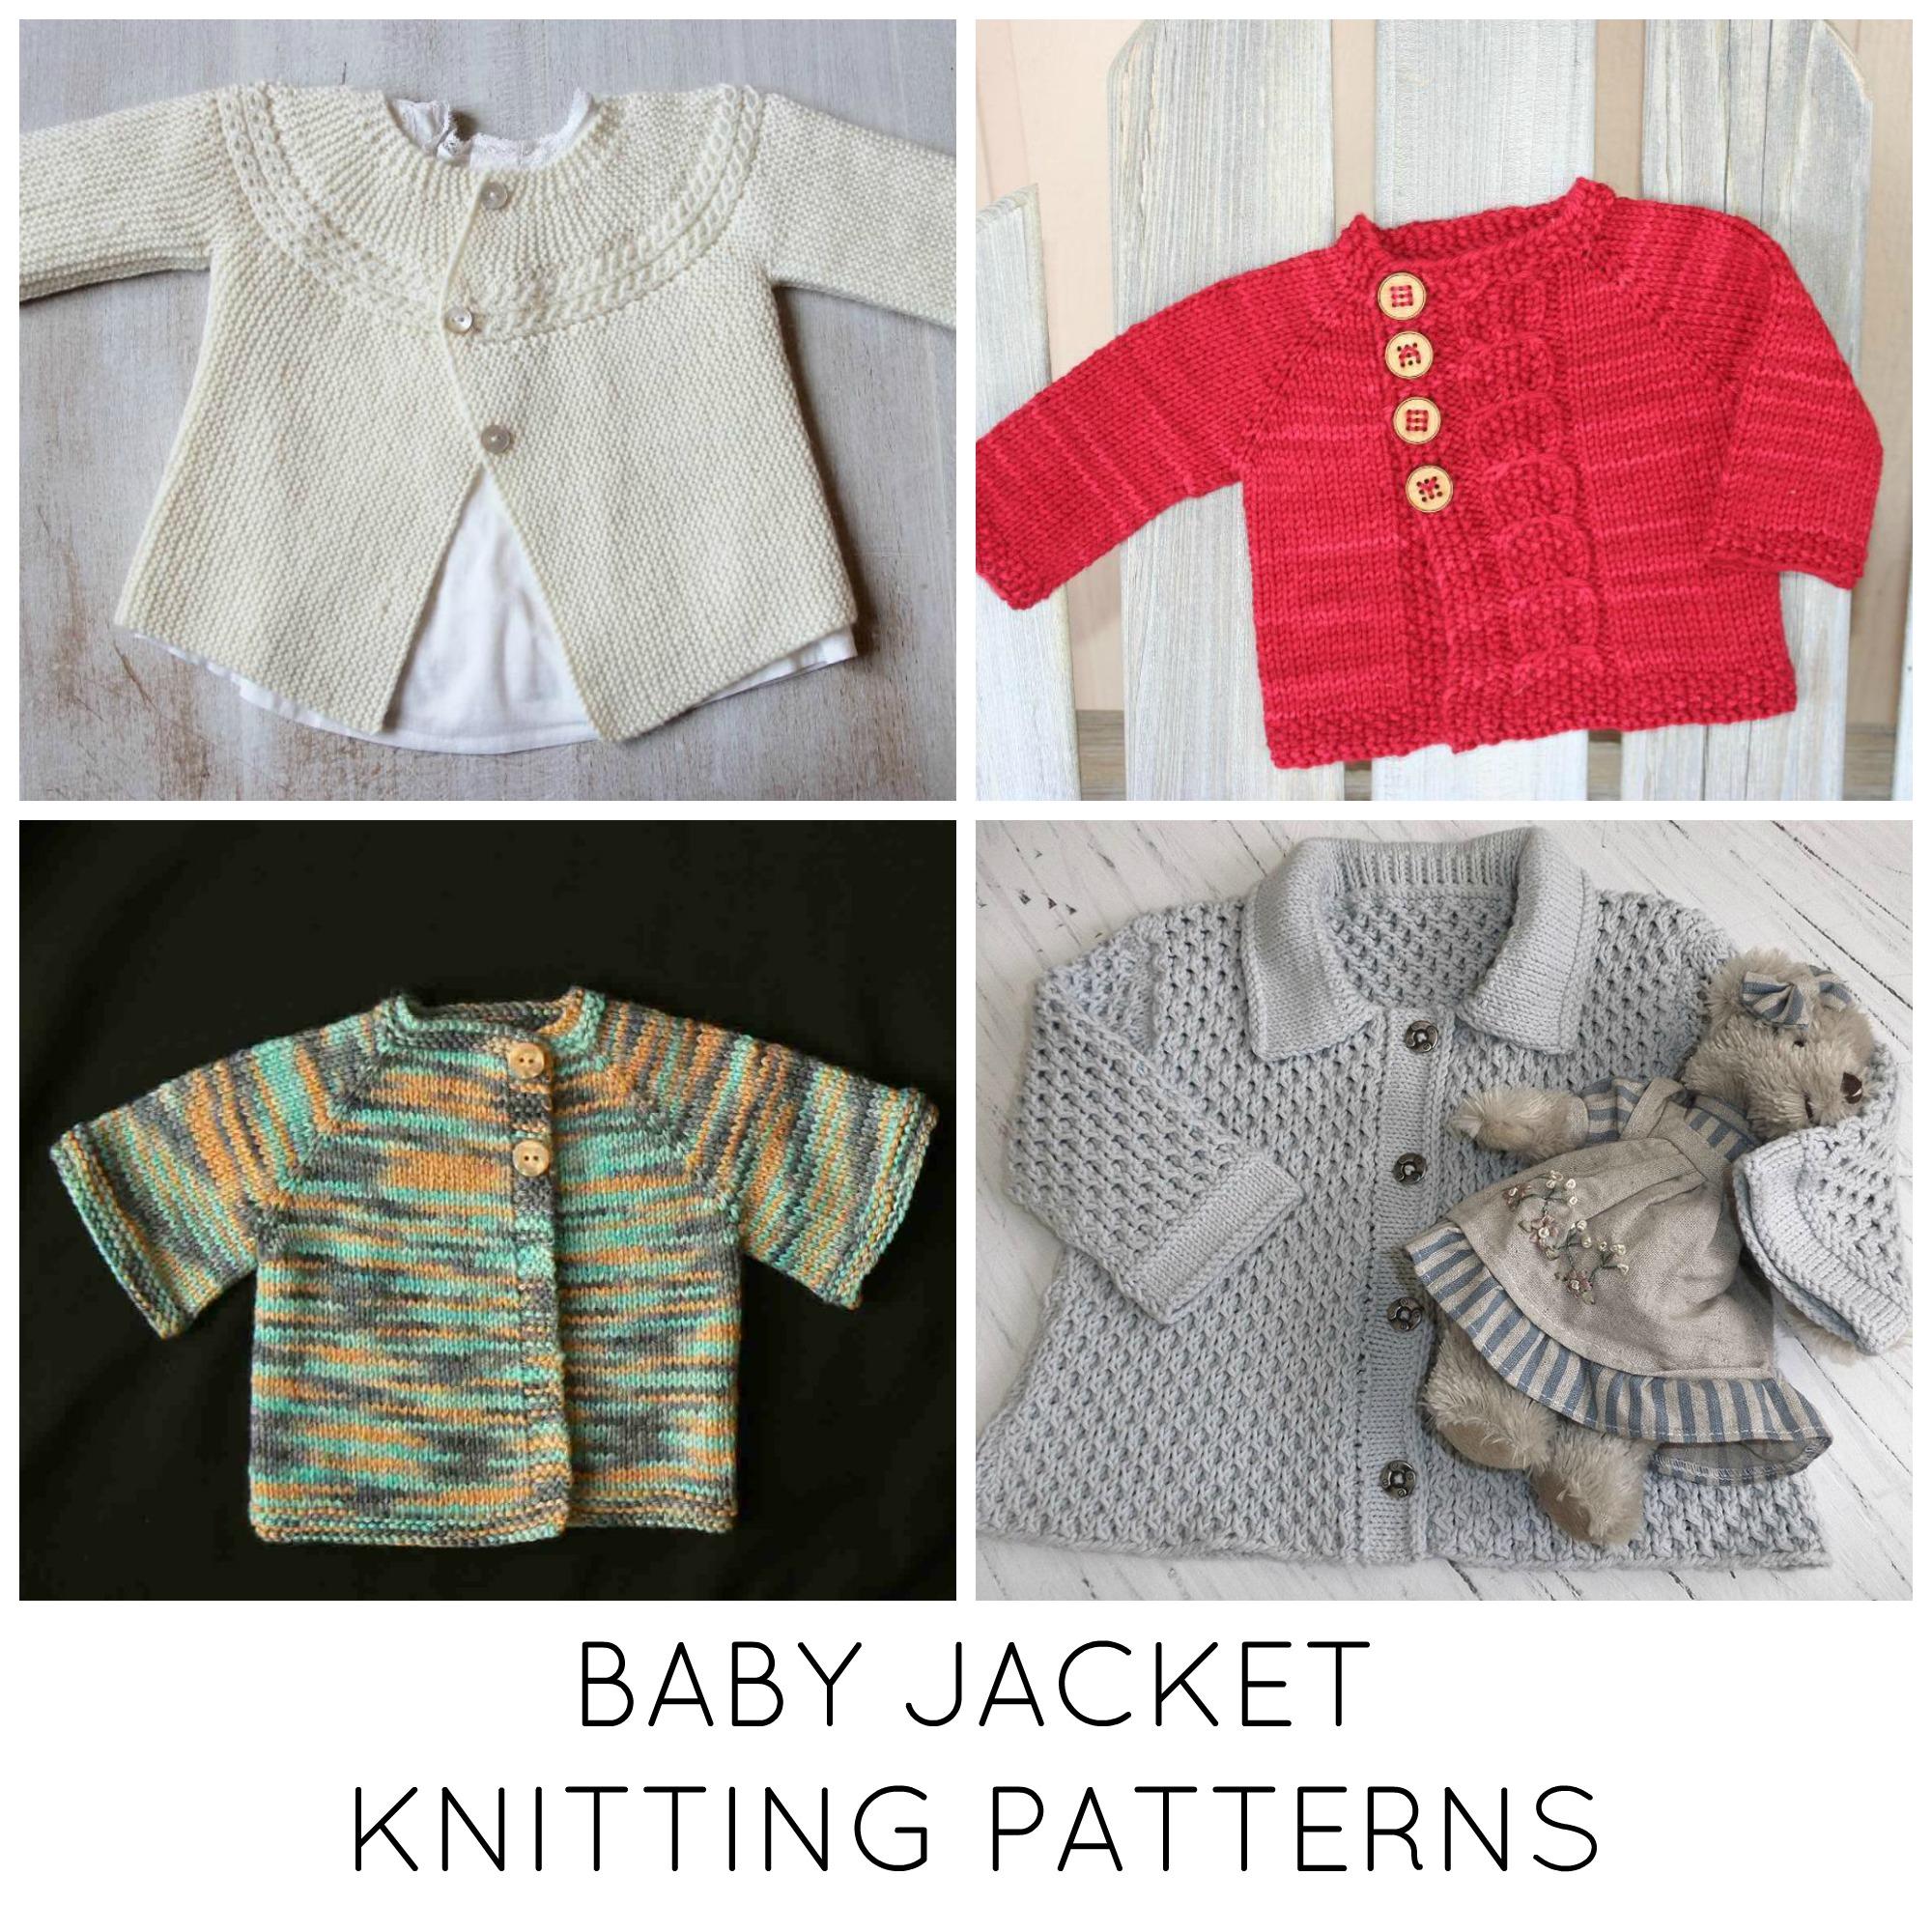 Baby Jacket Knitting Patterns